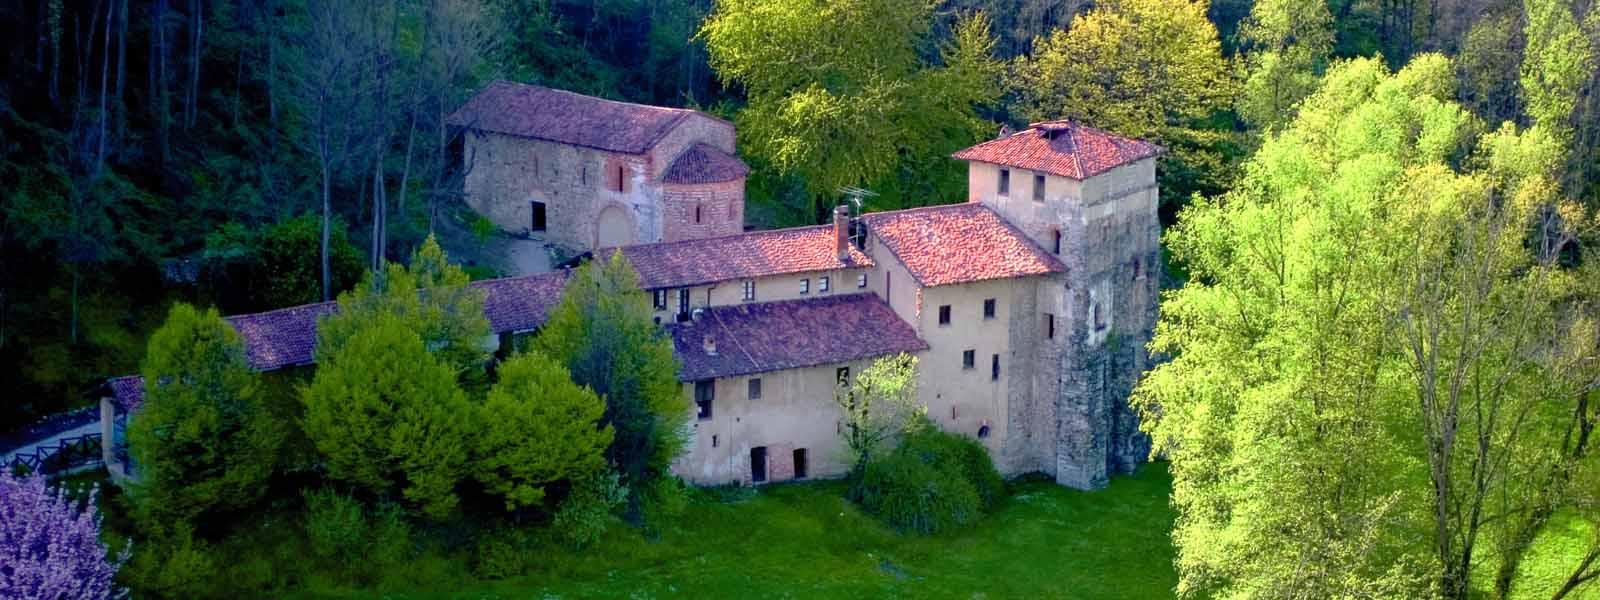 monastero-di-torba-secret-world